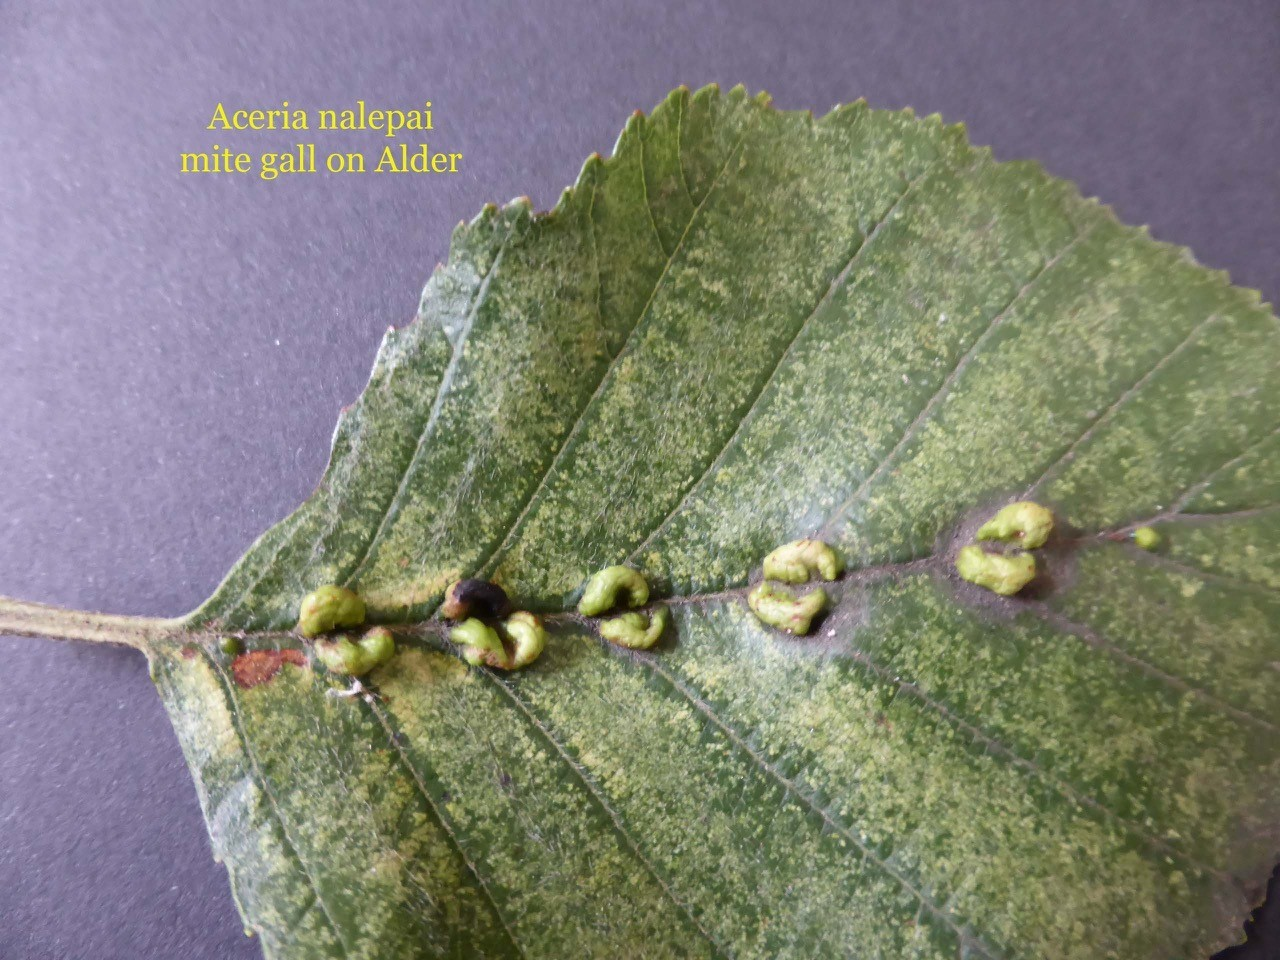 Aceria nalepai mite gall on Alder